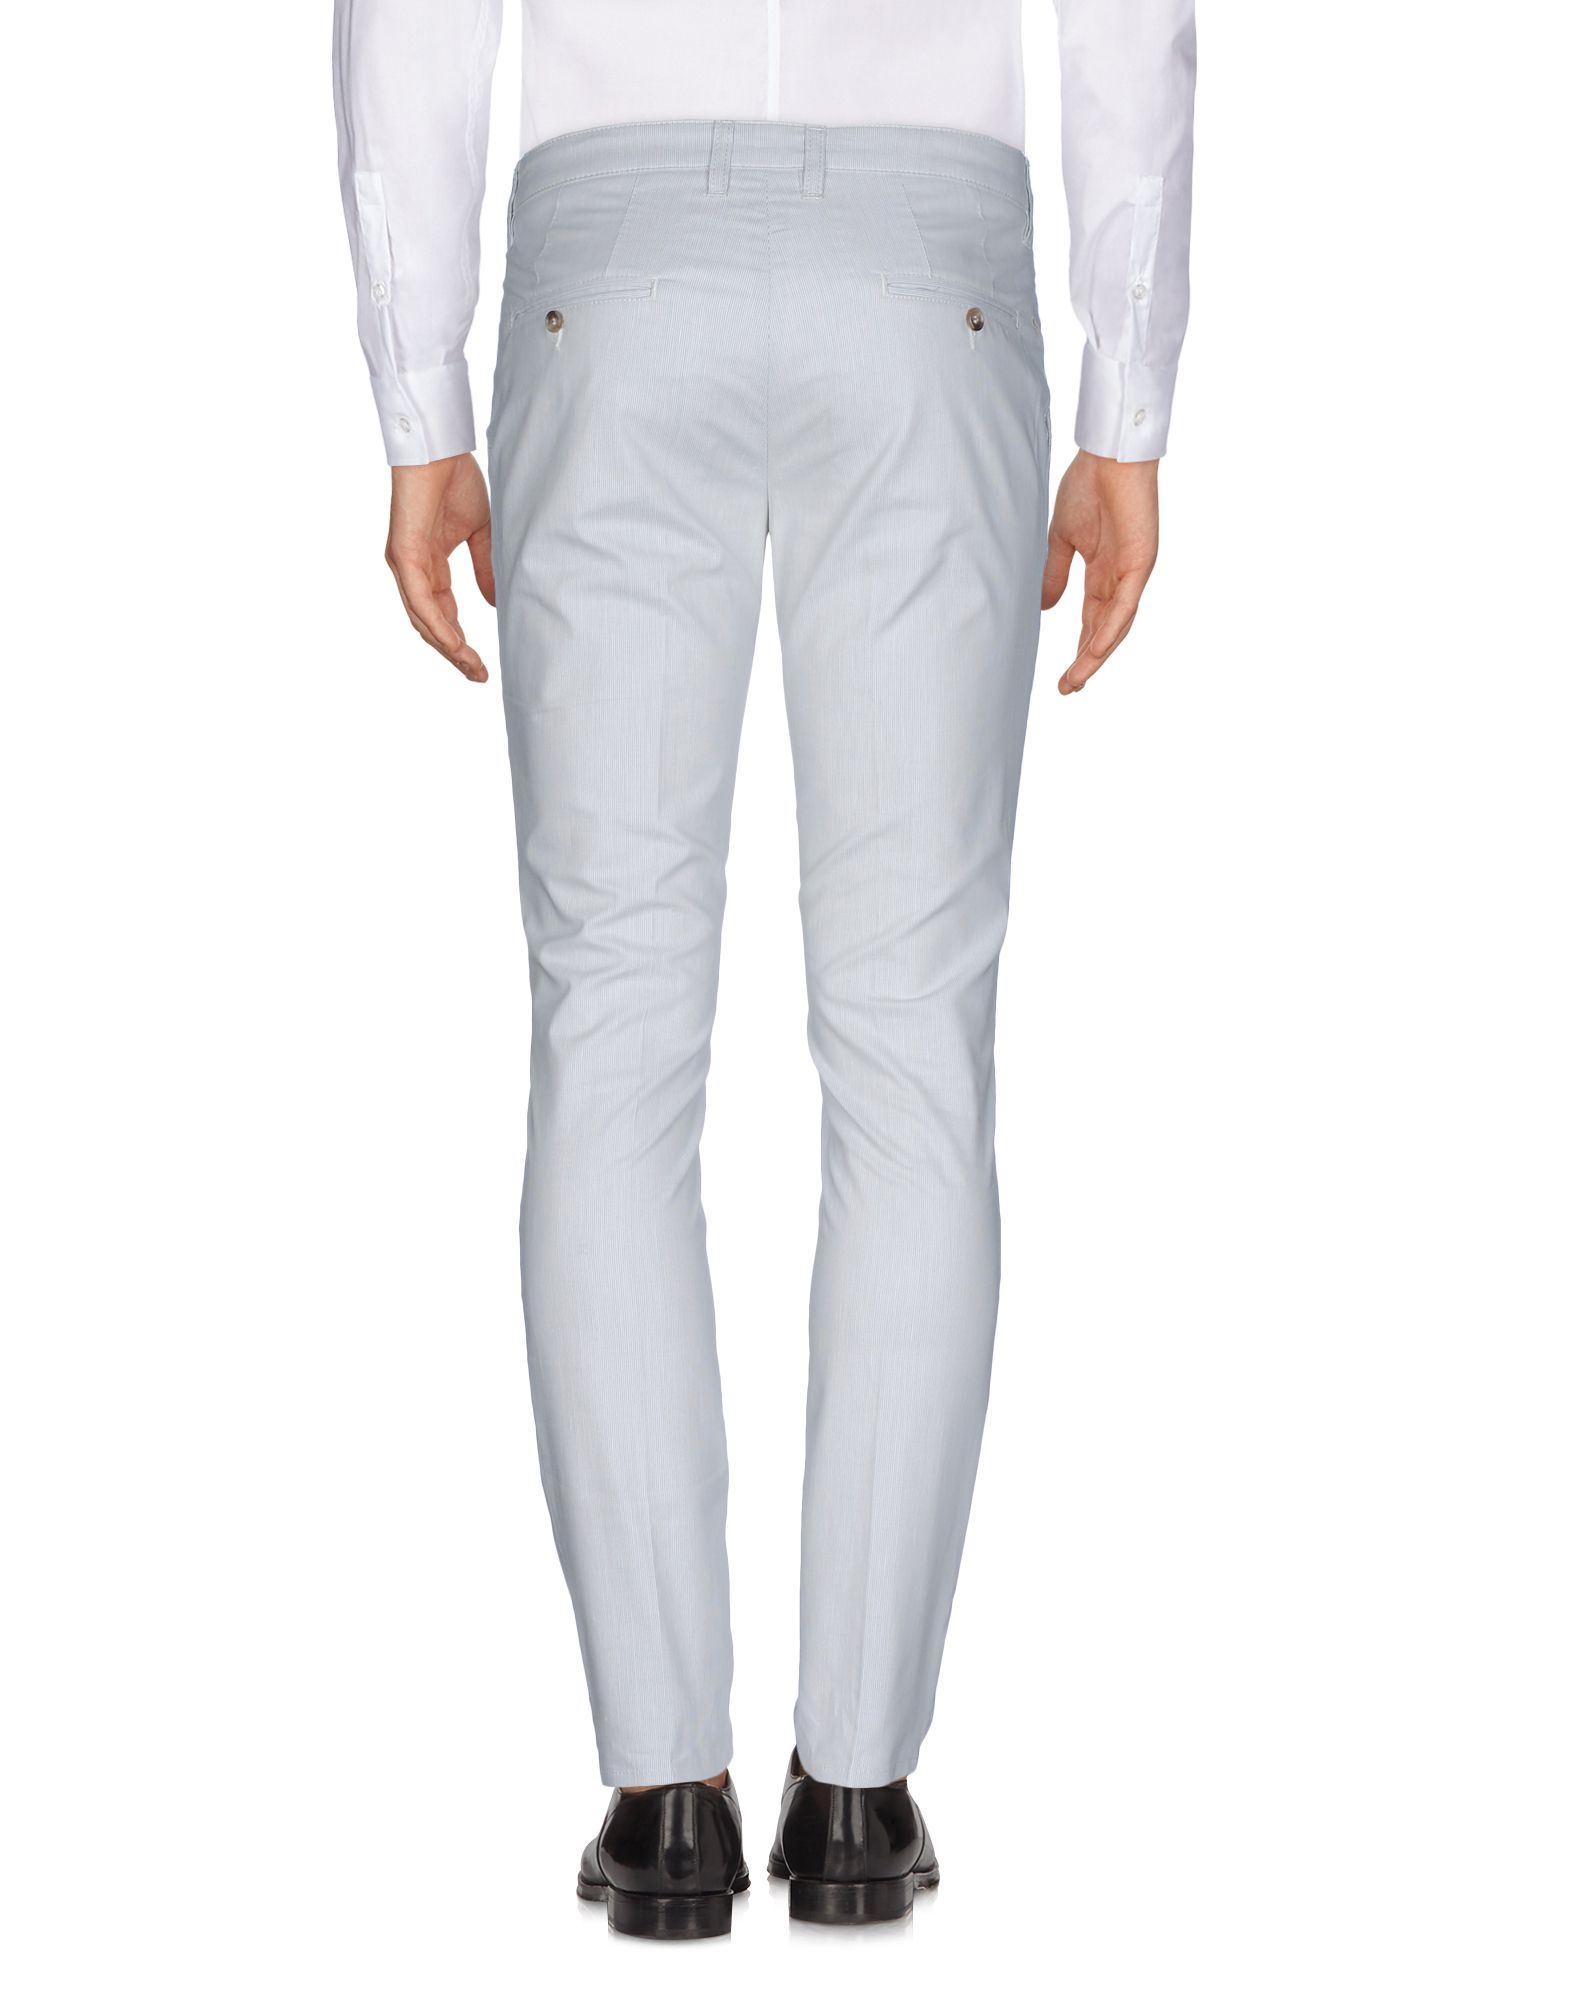 Pantalone Pantalone  Cruna Uomo - 13107733QC a18d71